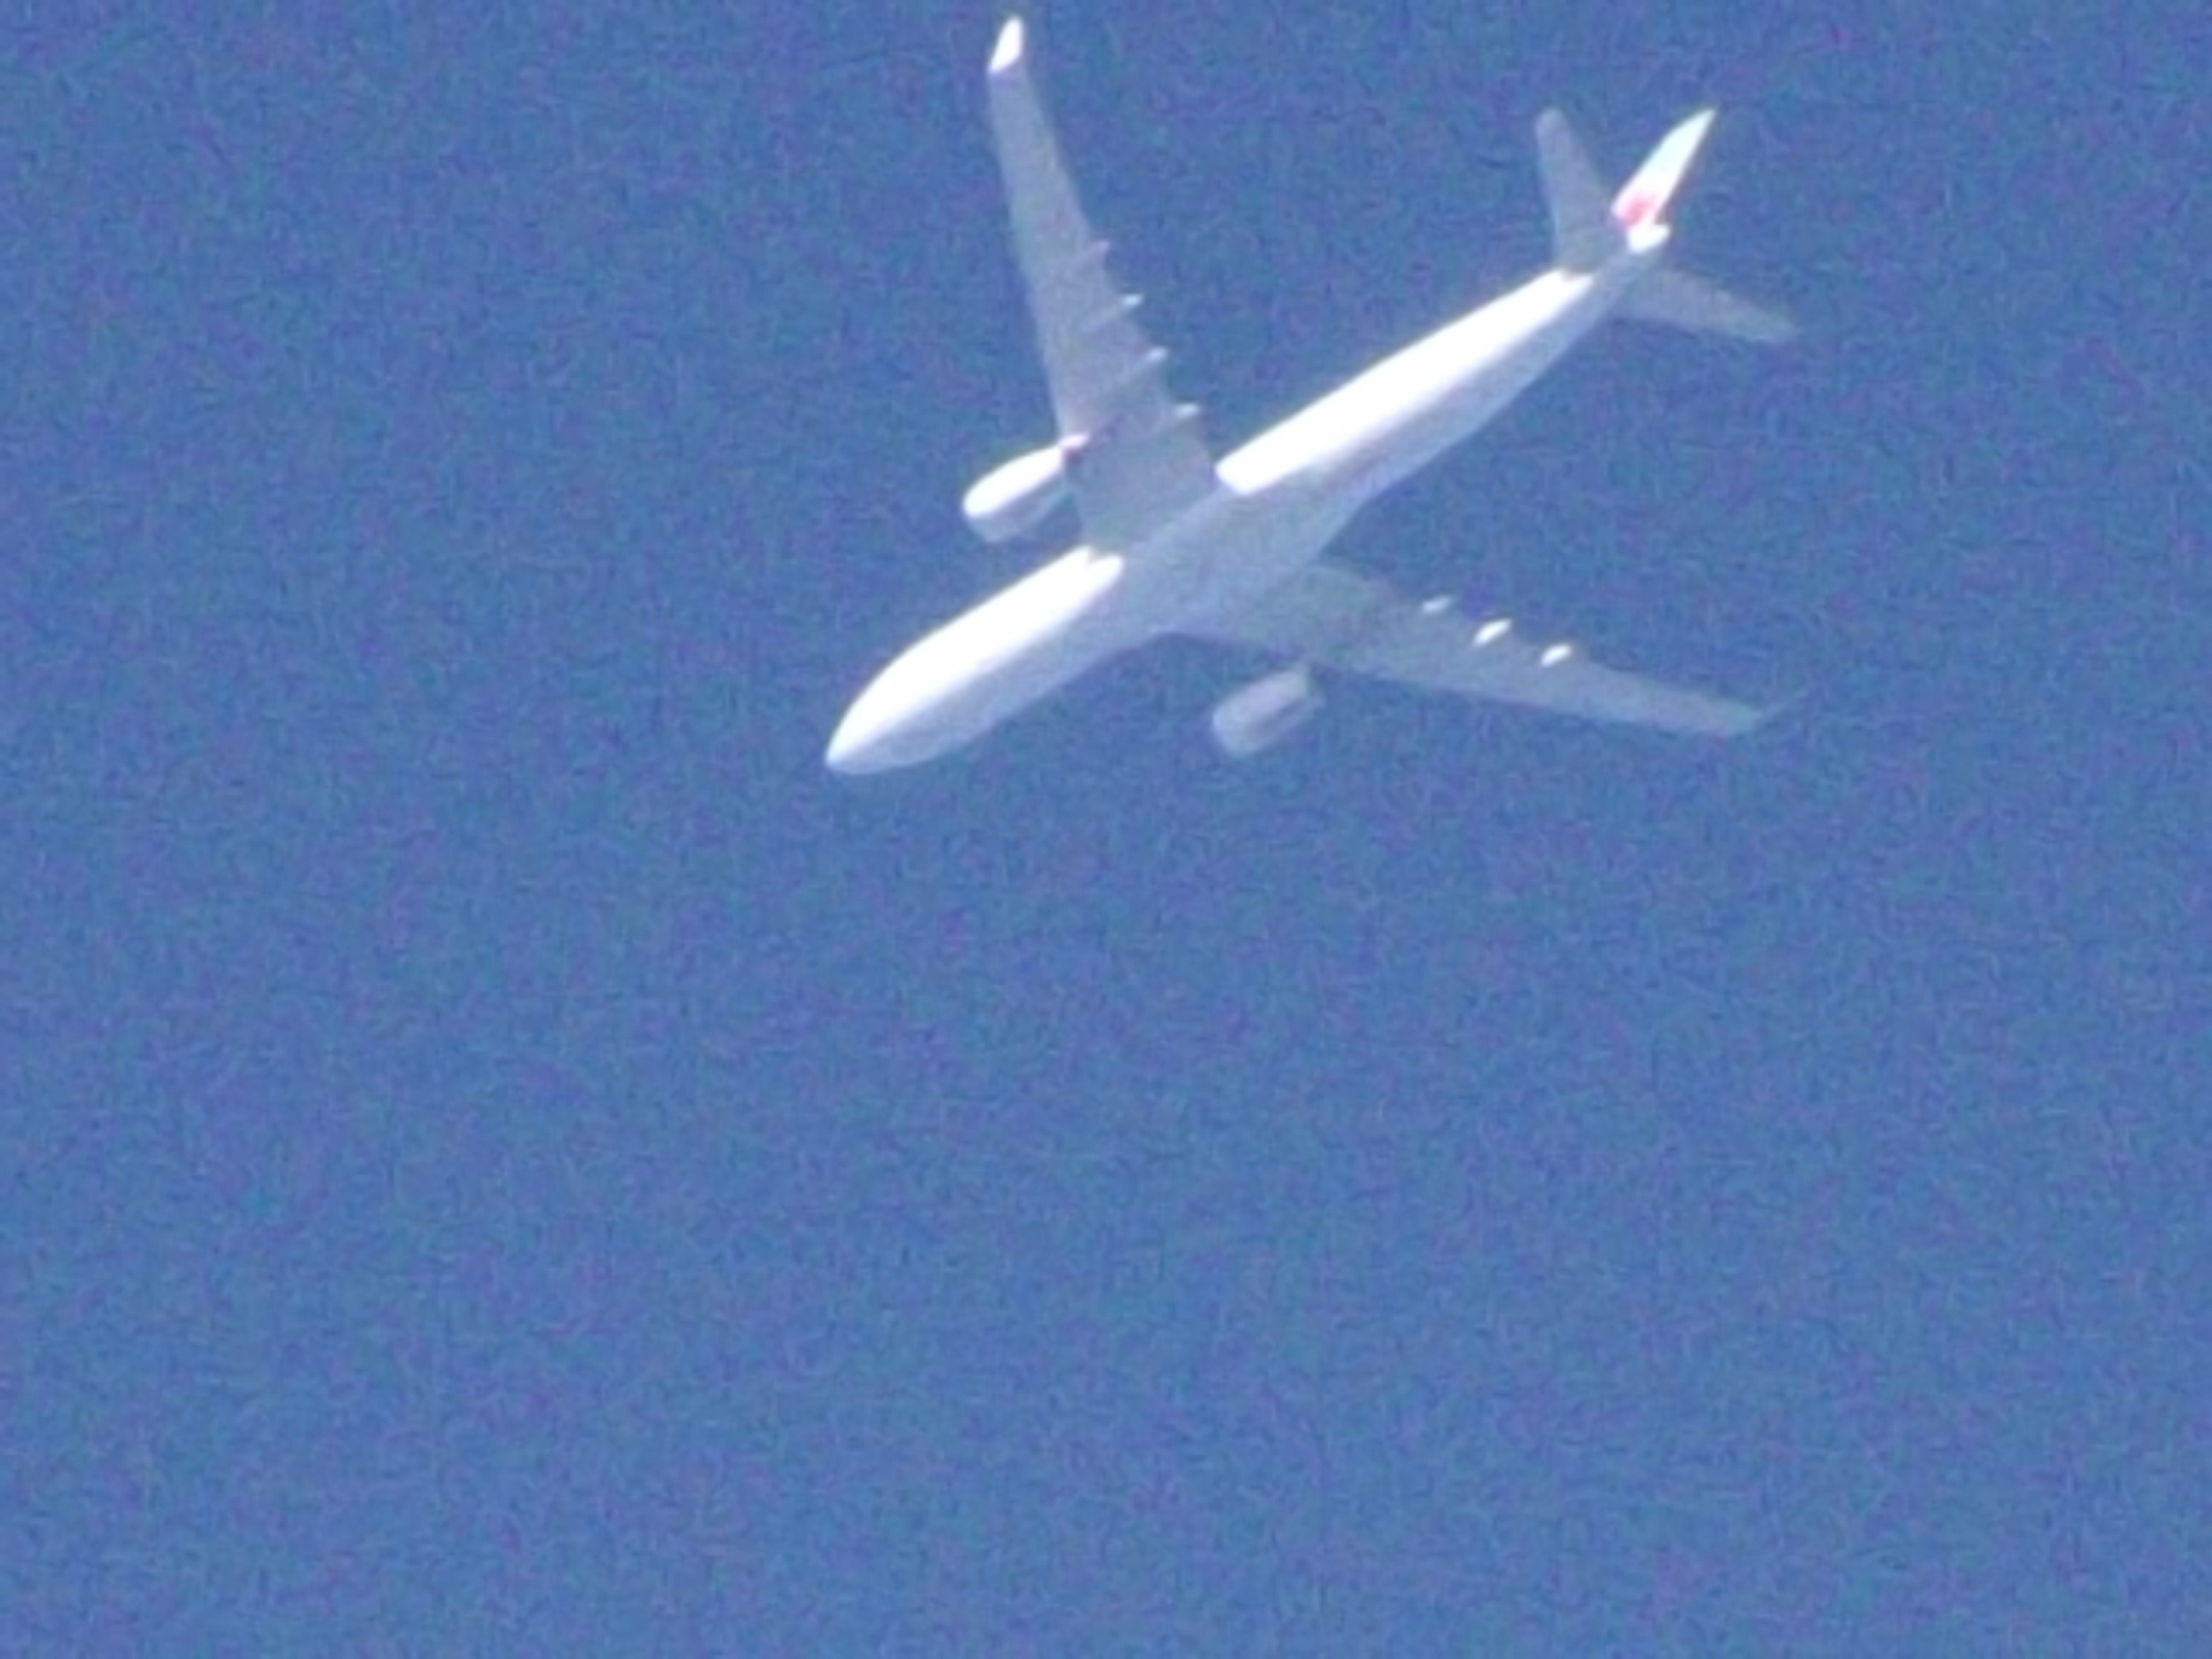 jumbo-jet-4298